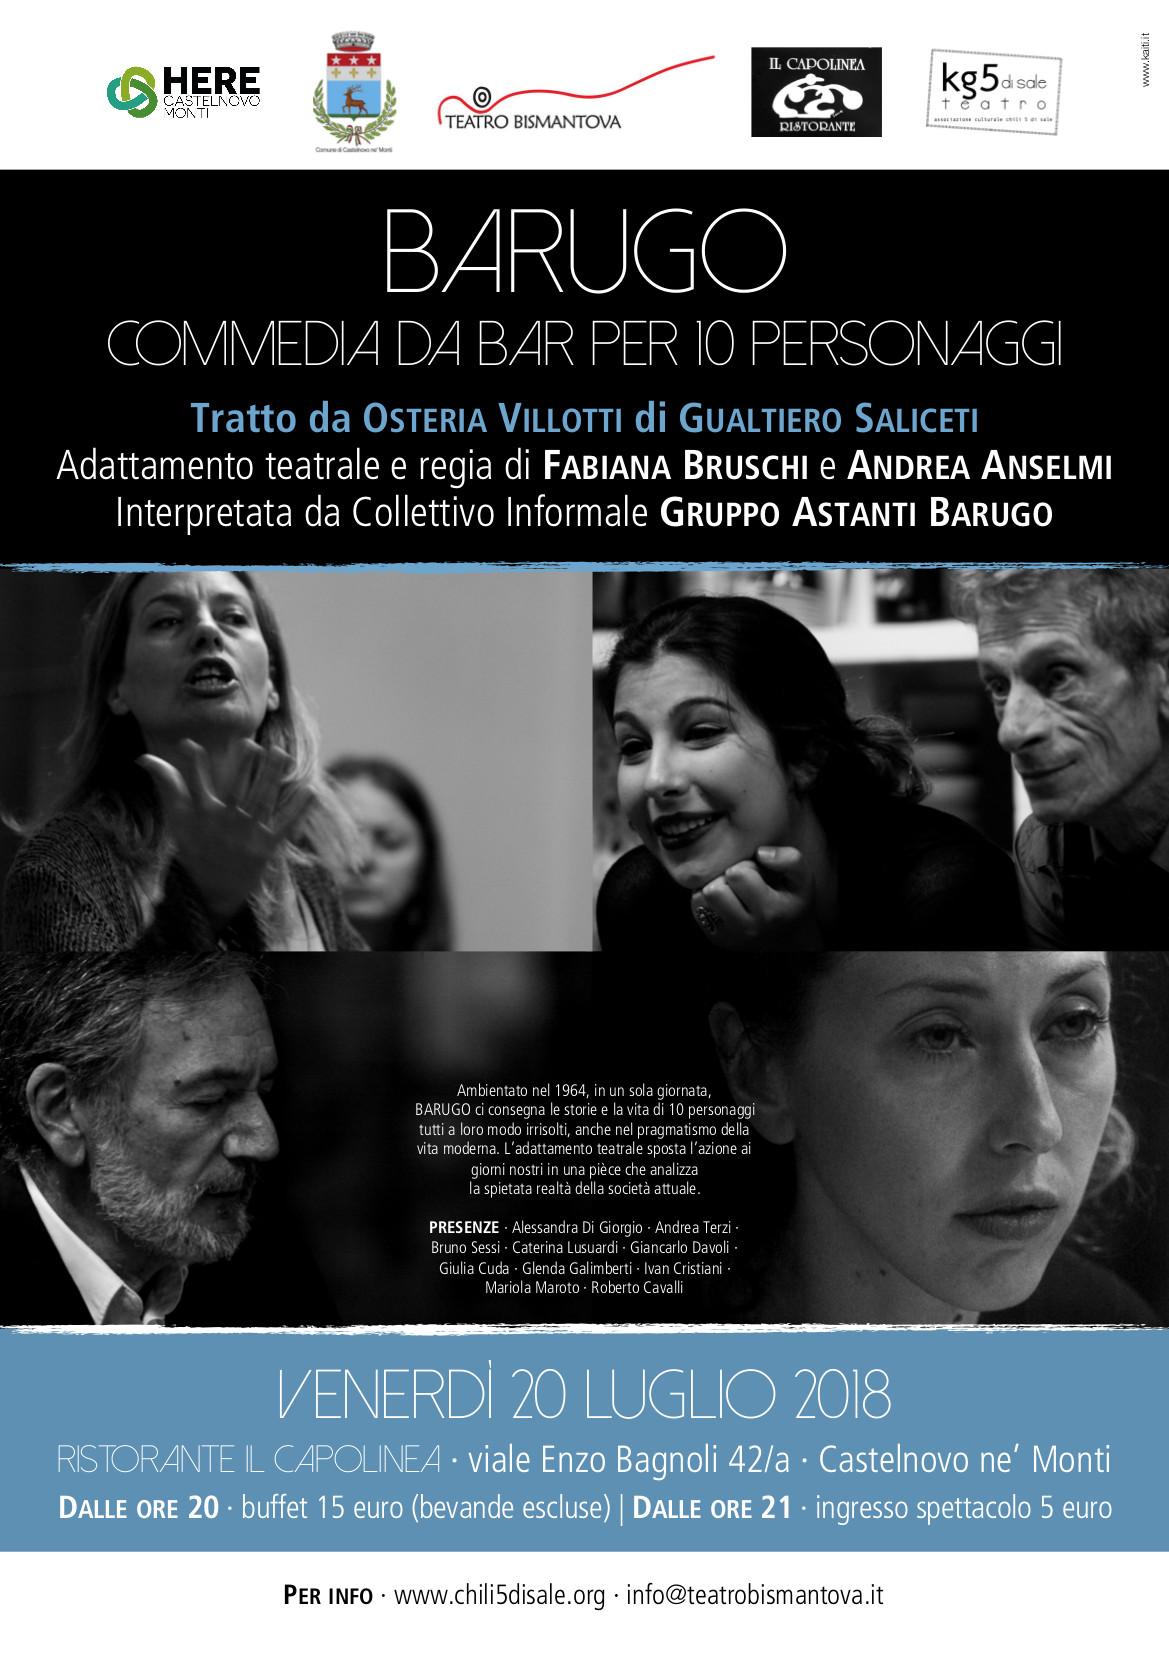 Barugo estate!